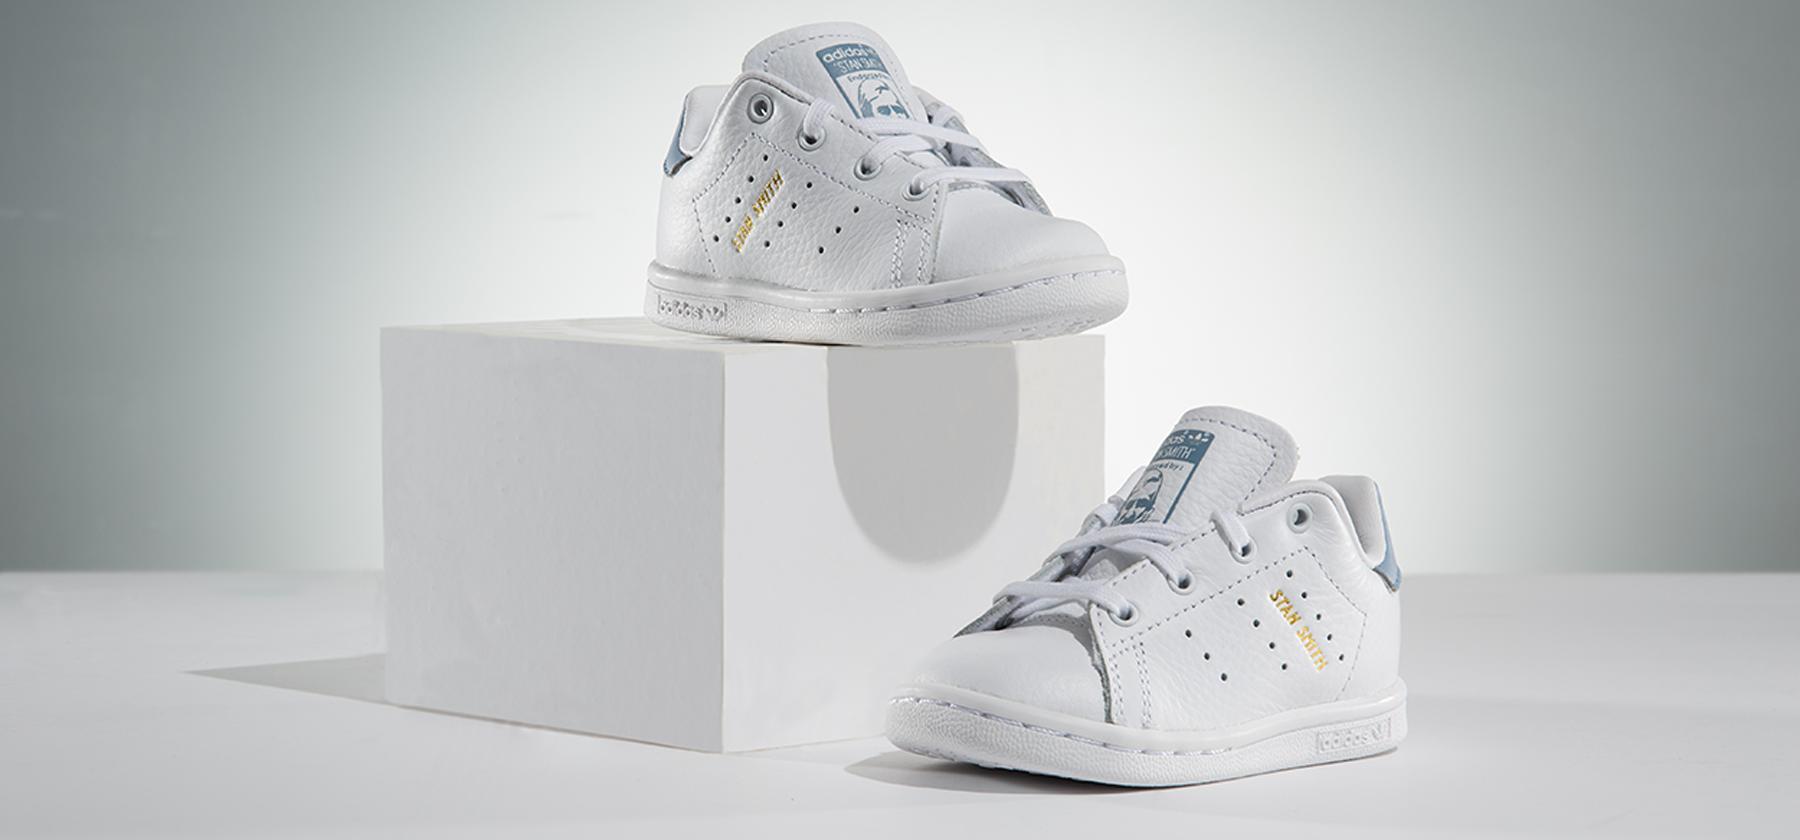 Stan Smith Baby Sneaker Still life